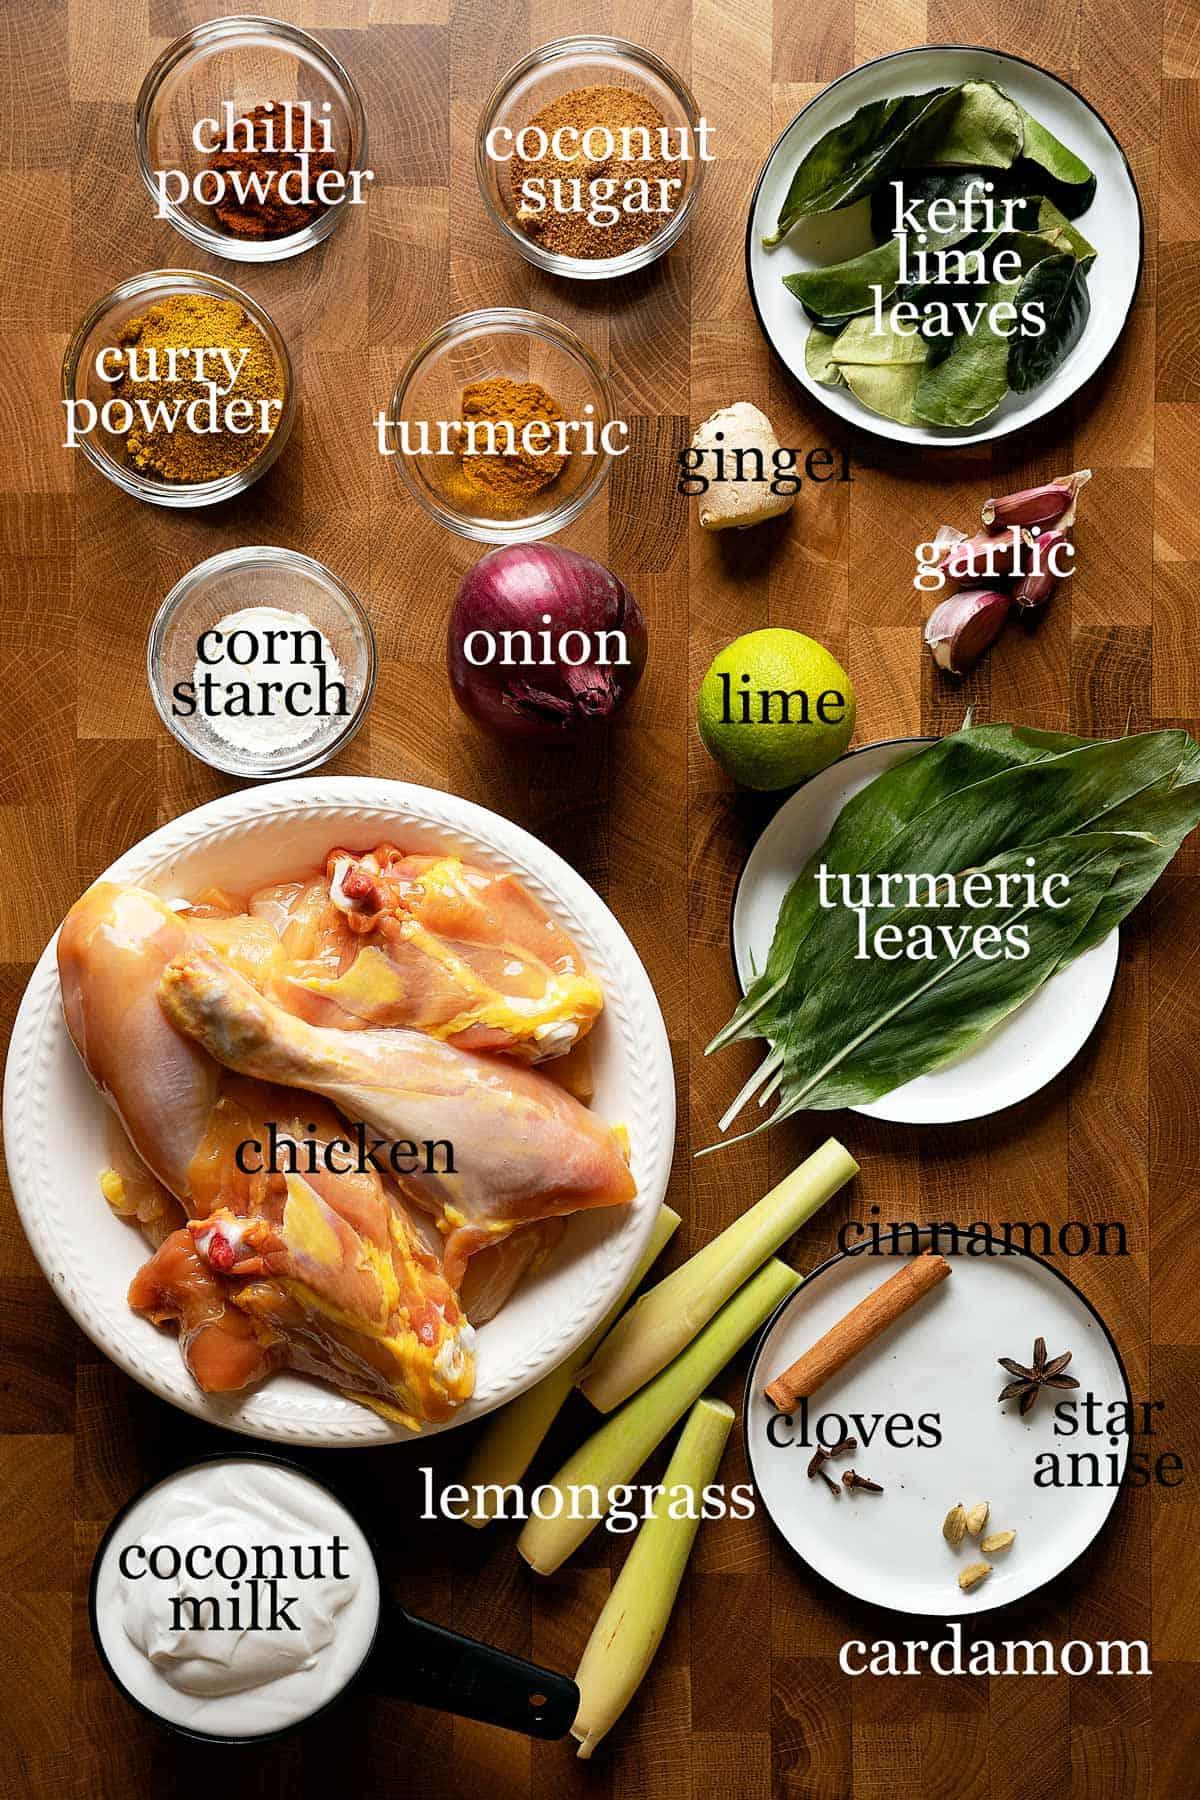 Ingredients to make slow cooker chicken rendang